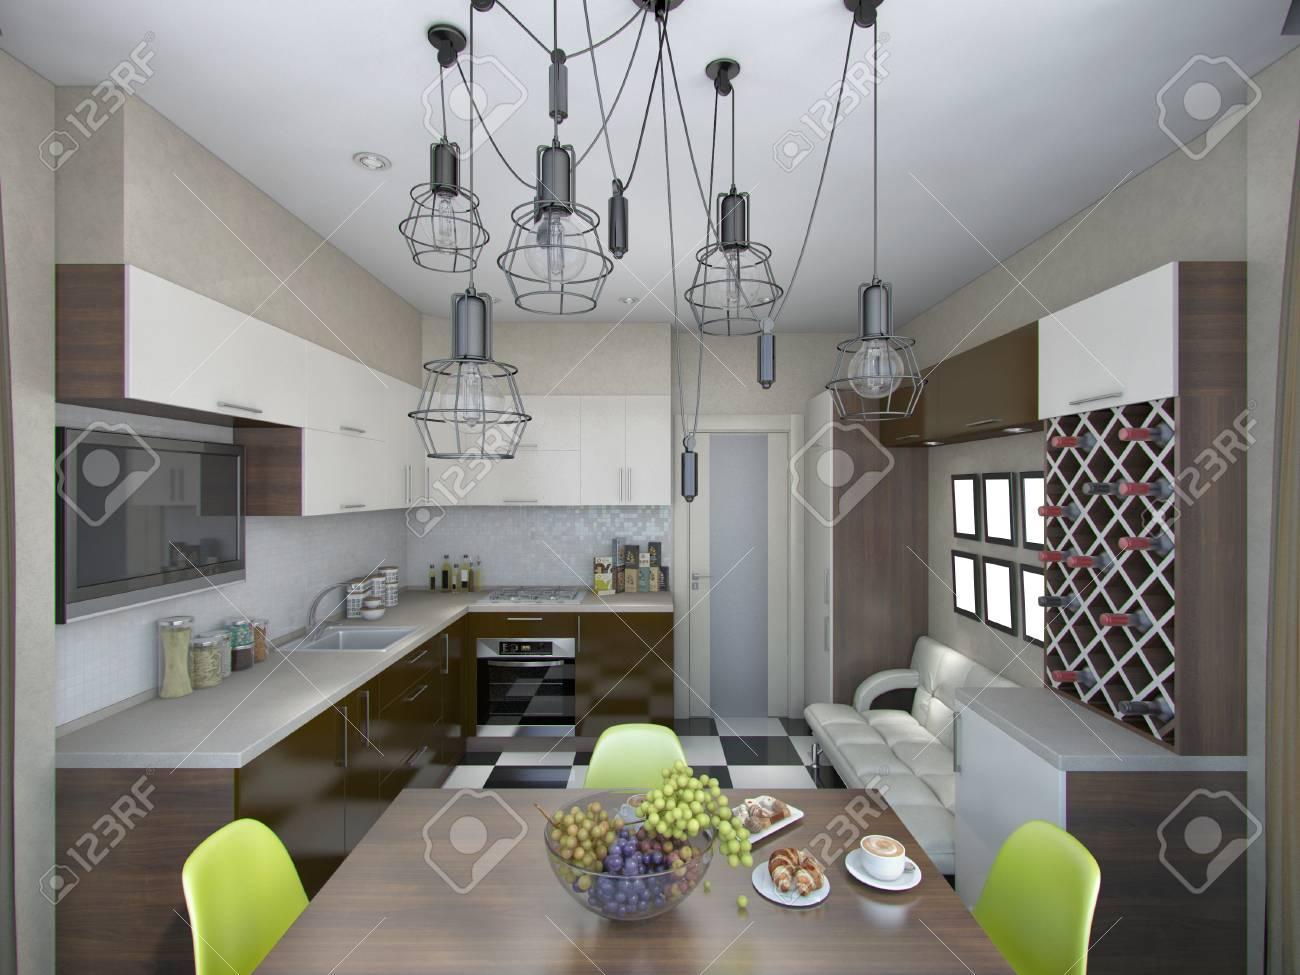 3d rendering of modern kitchen in brown and beige tones - 41962191